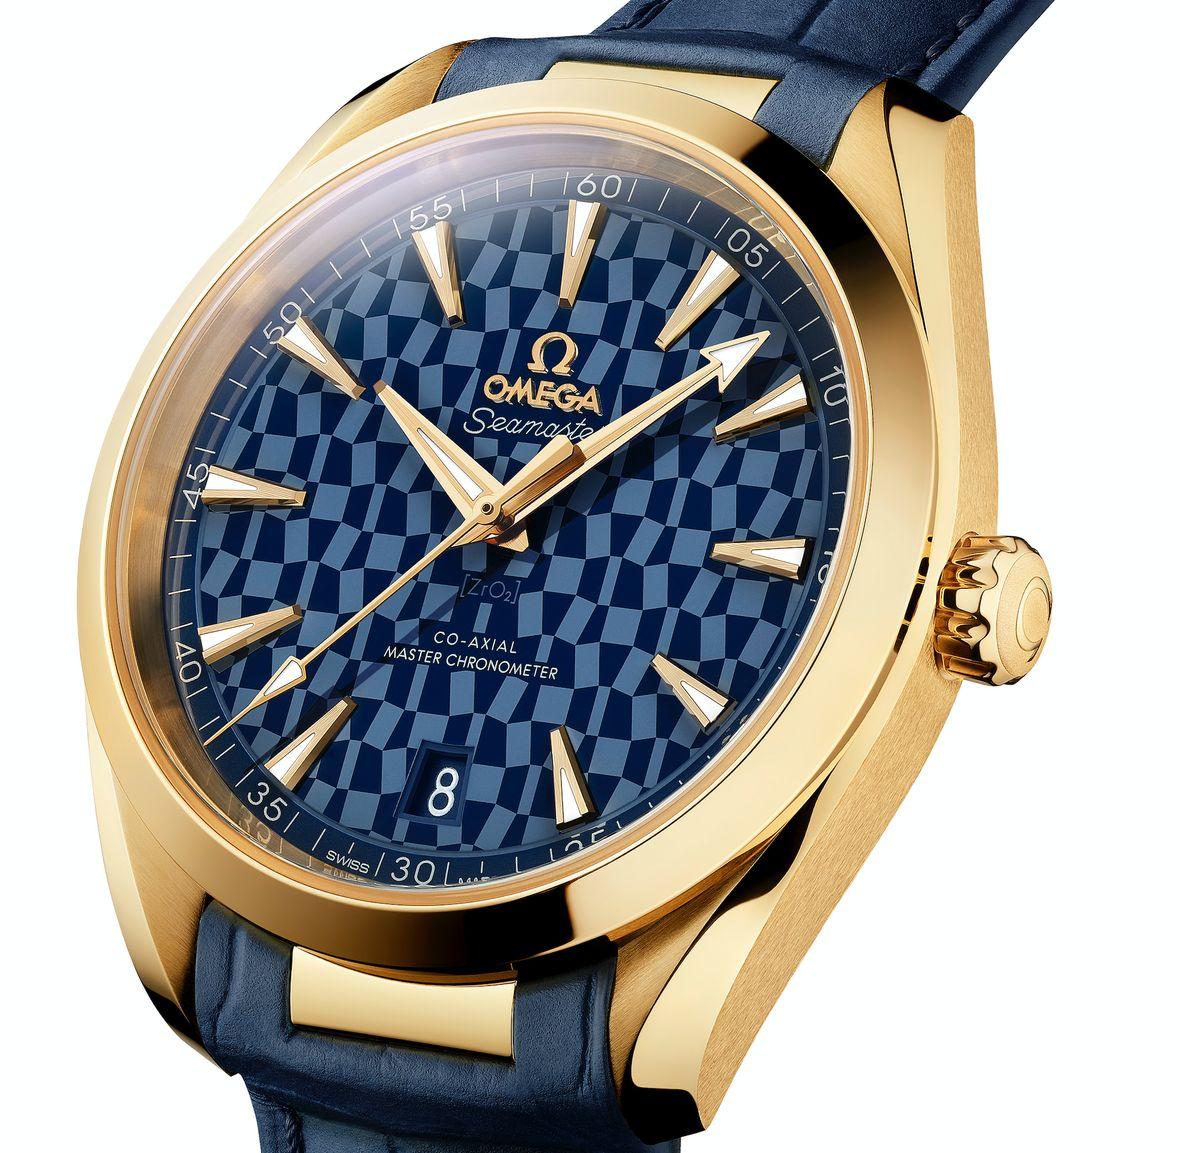 Omega Seamaster Aqua Terra Tokyo 2020 Olympics 18k Gold